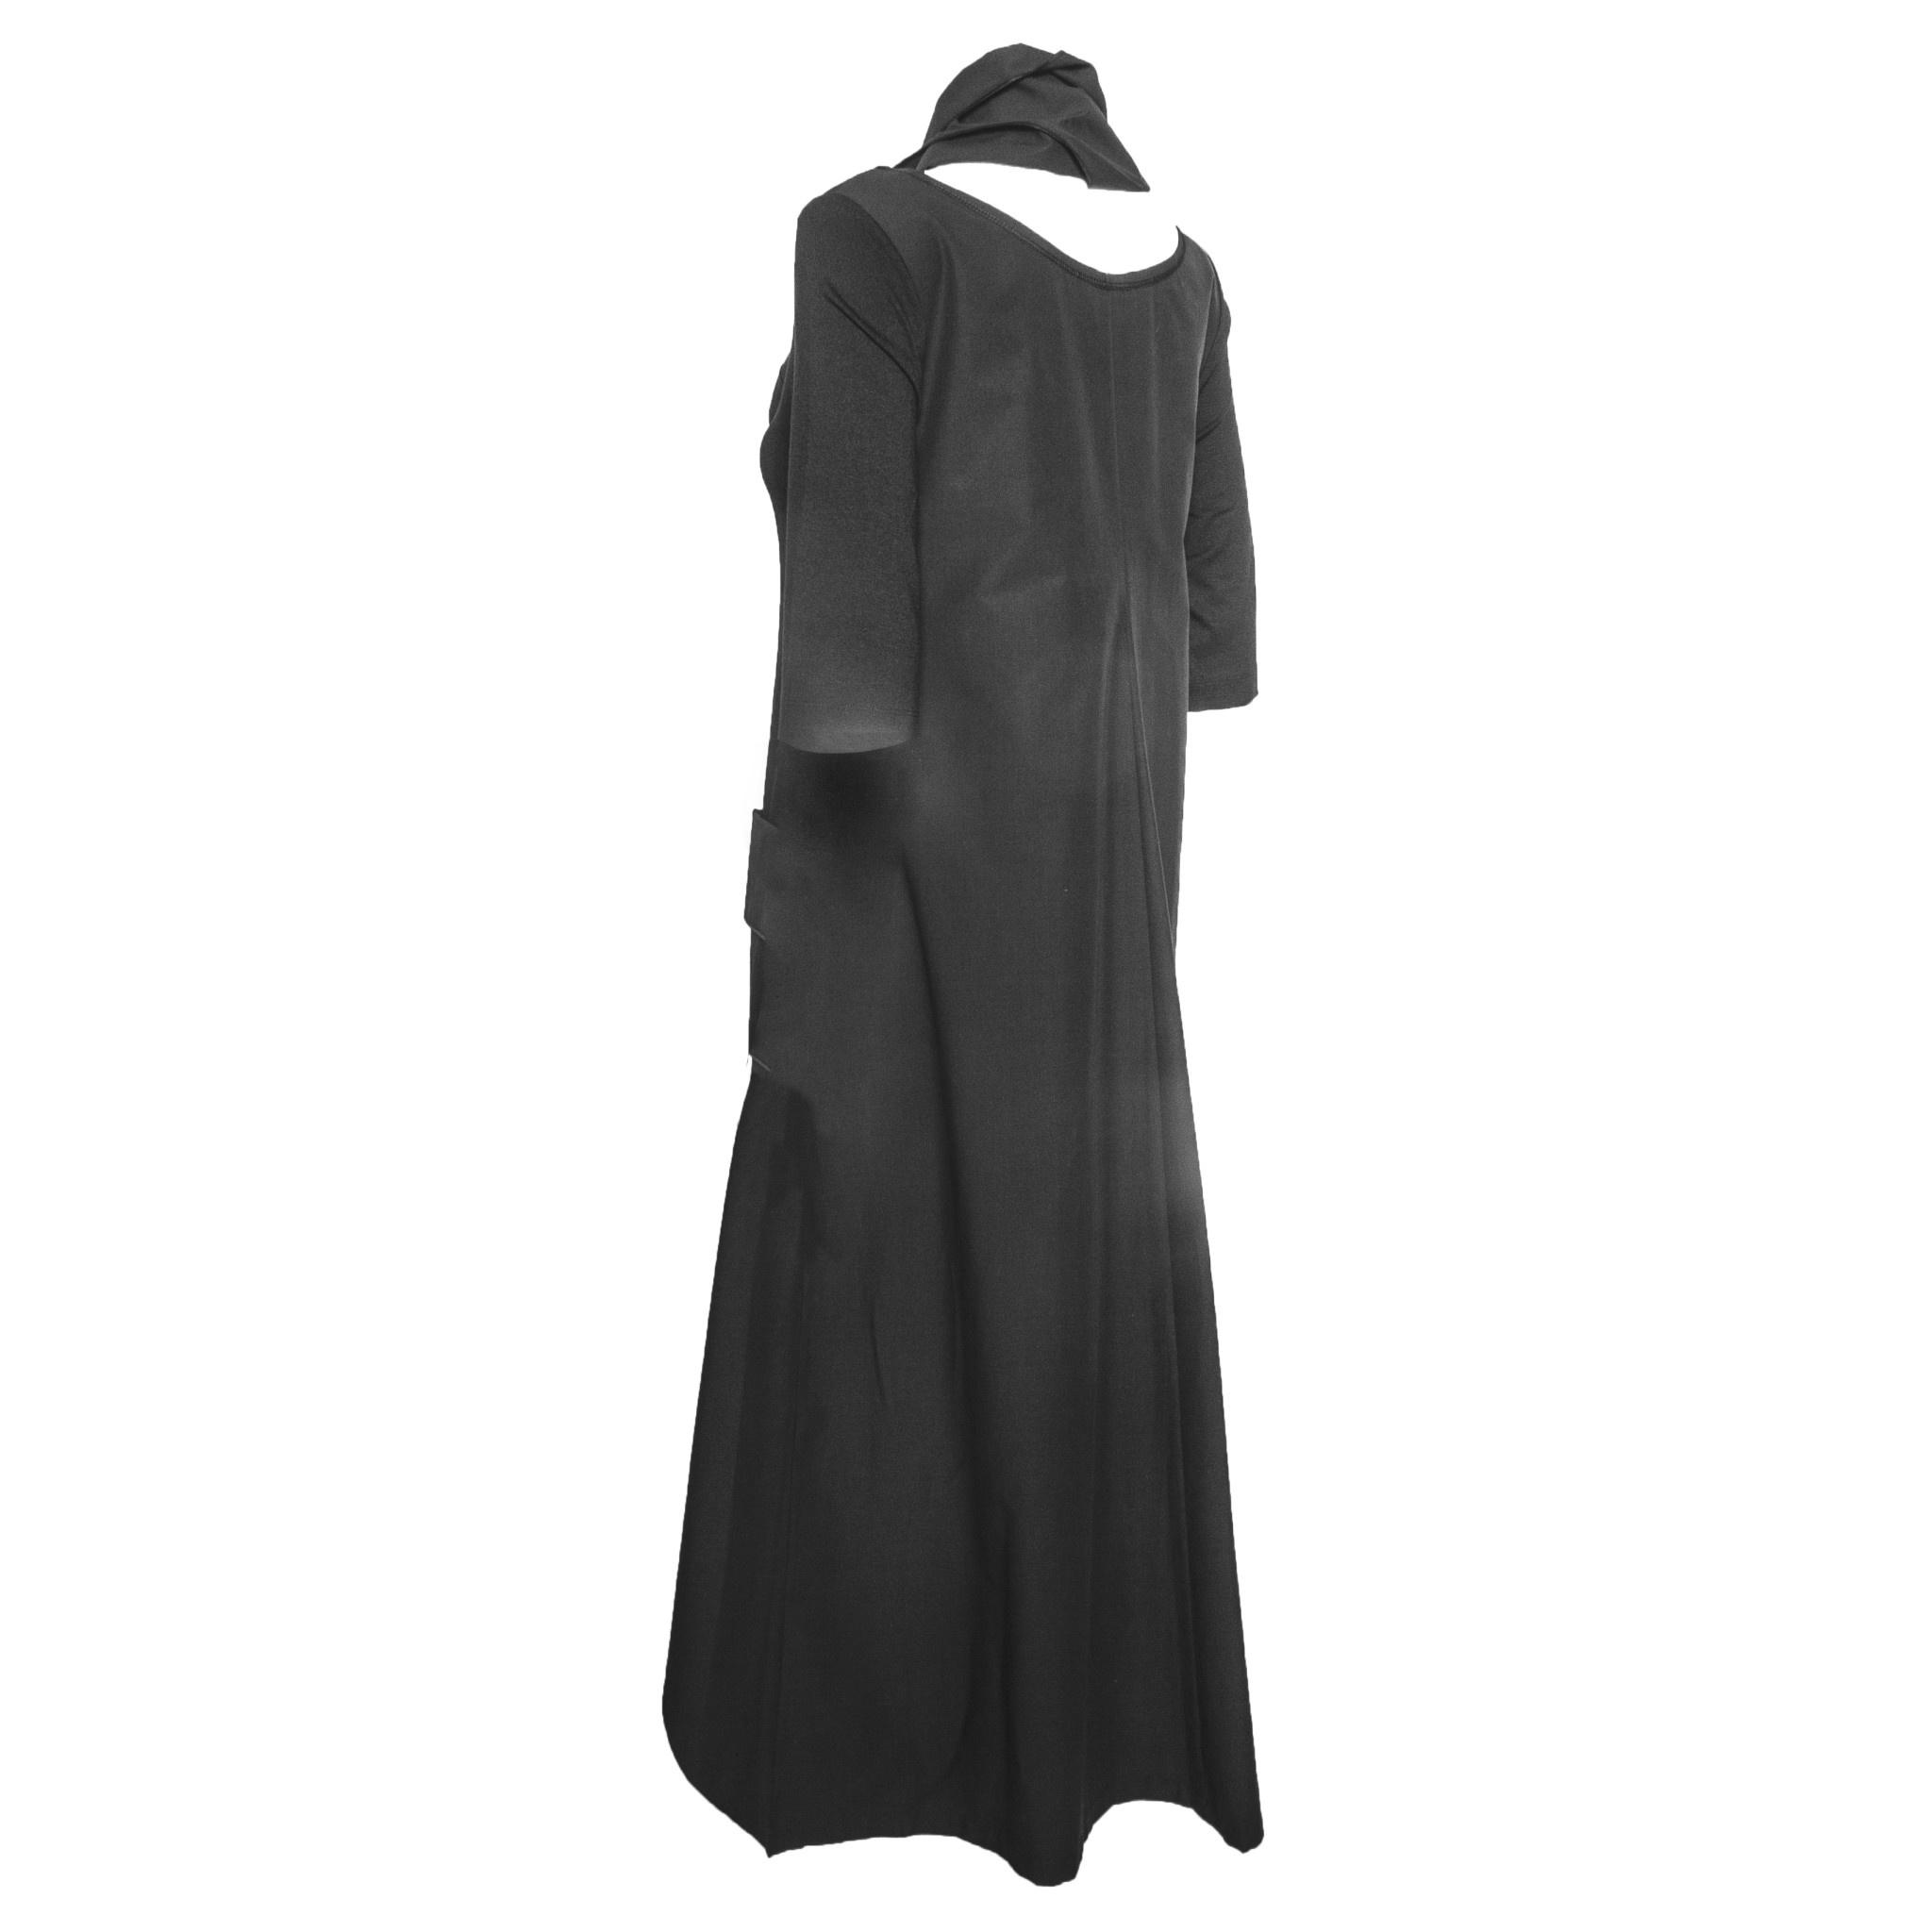 Xenia Xenia Anka Dress - Black